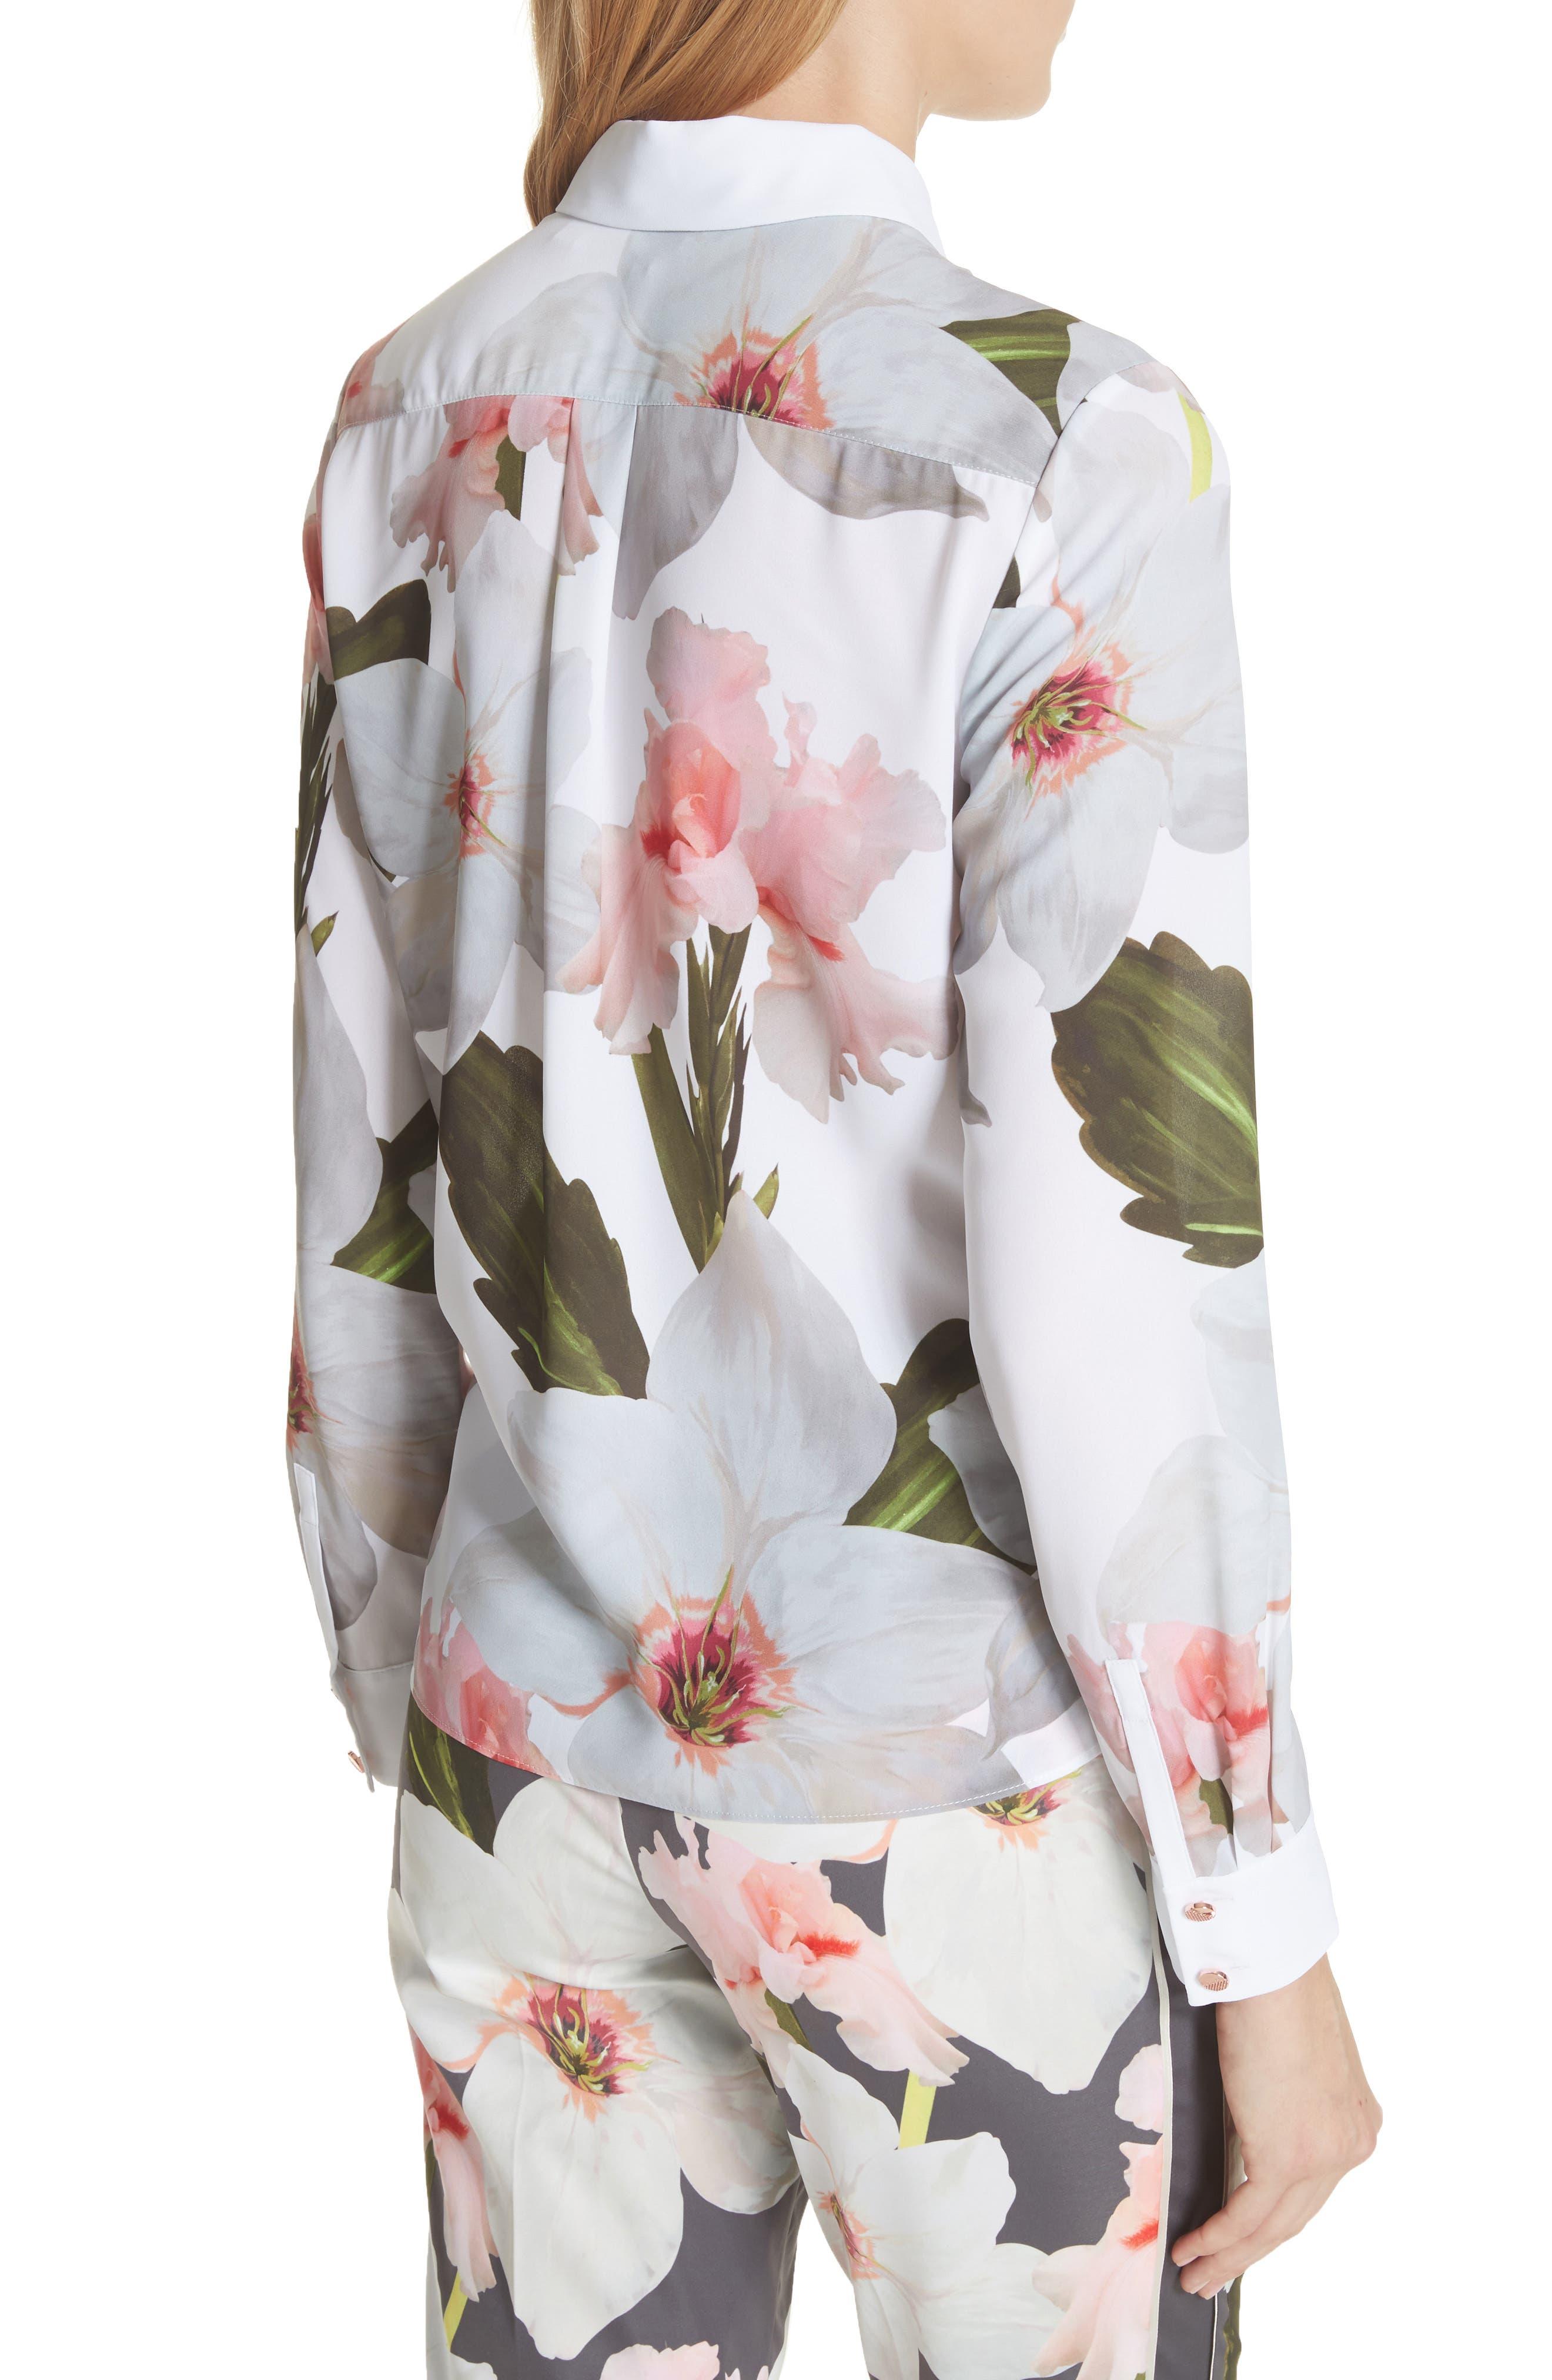 Chatsworth Bloom Shirt,                             Alternate thumbnail 2, color,                             White